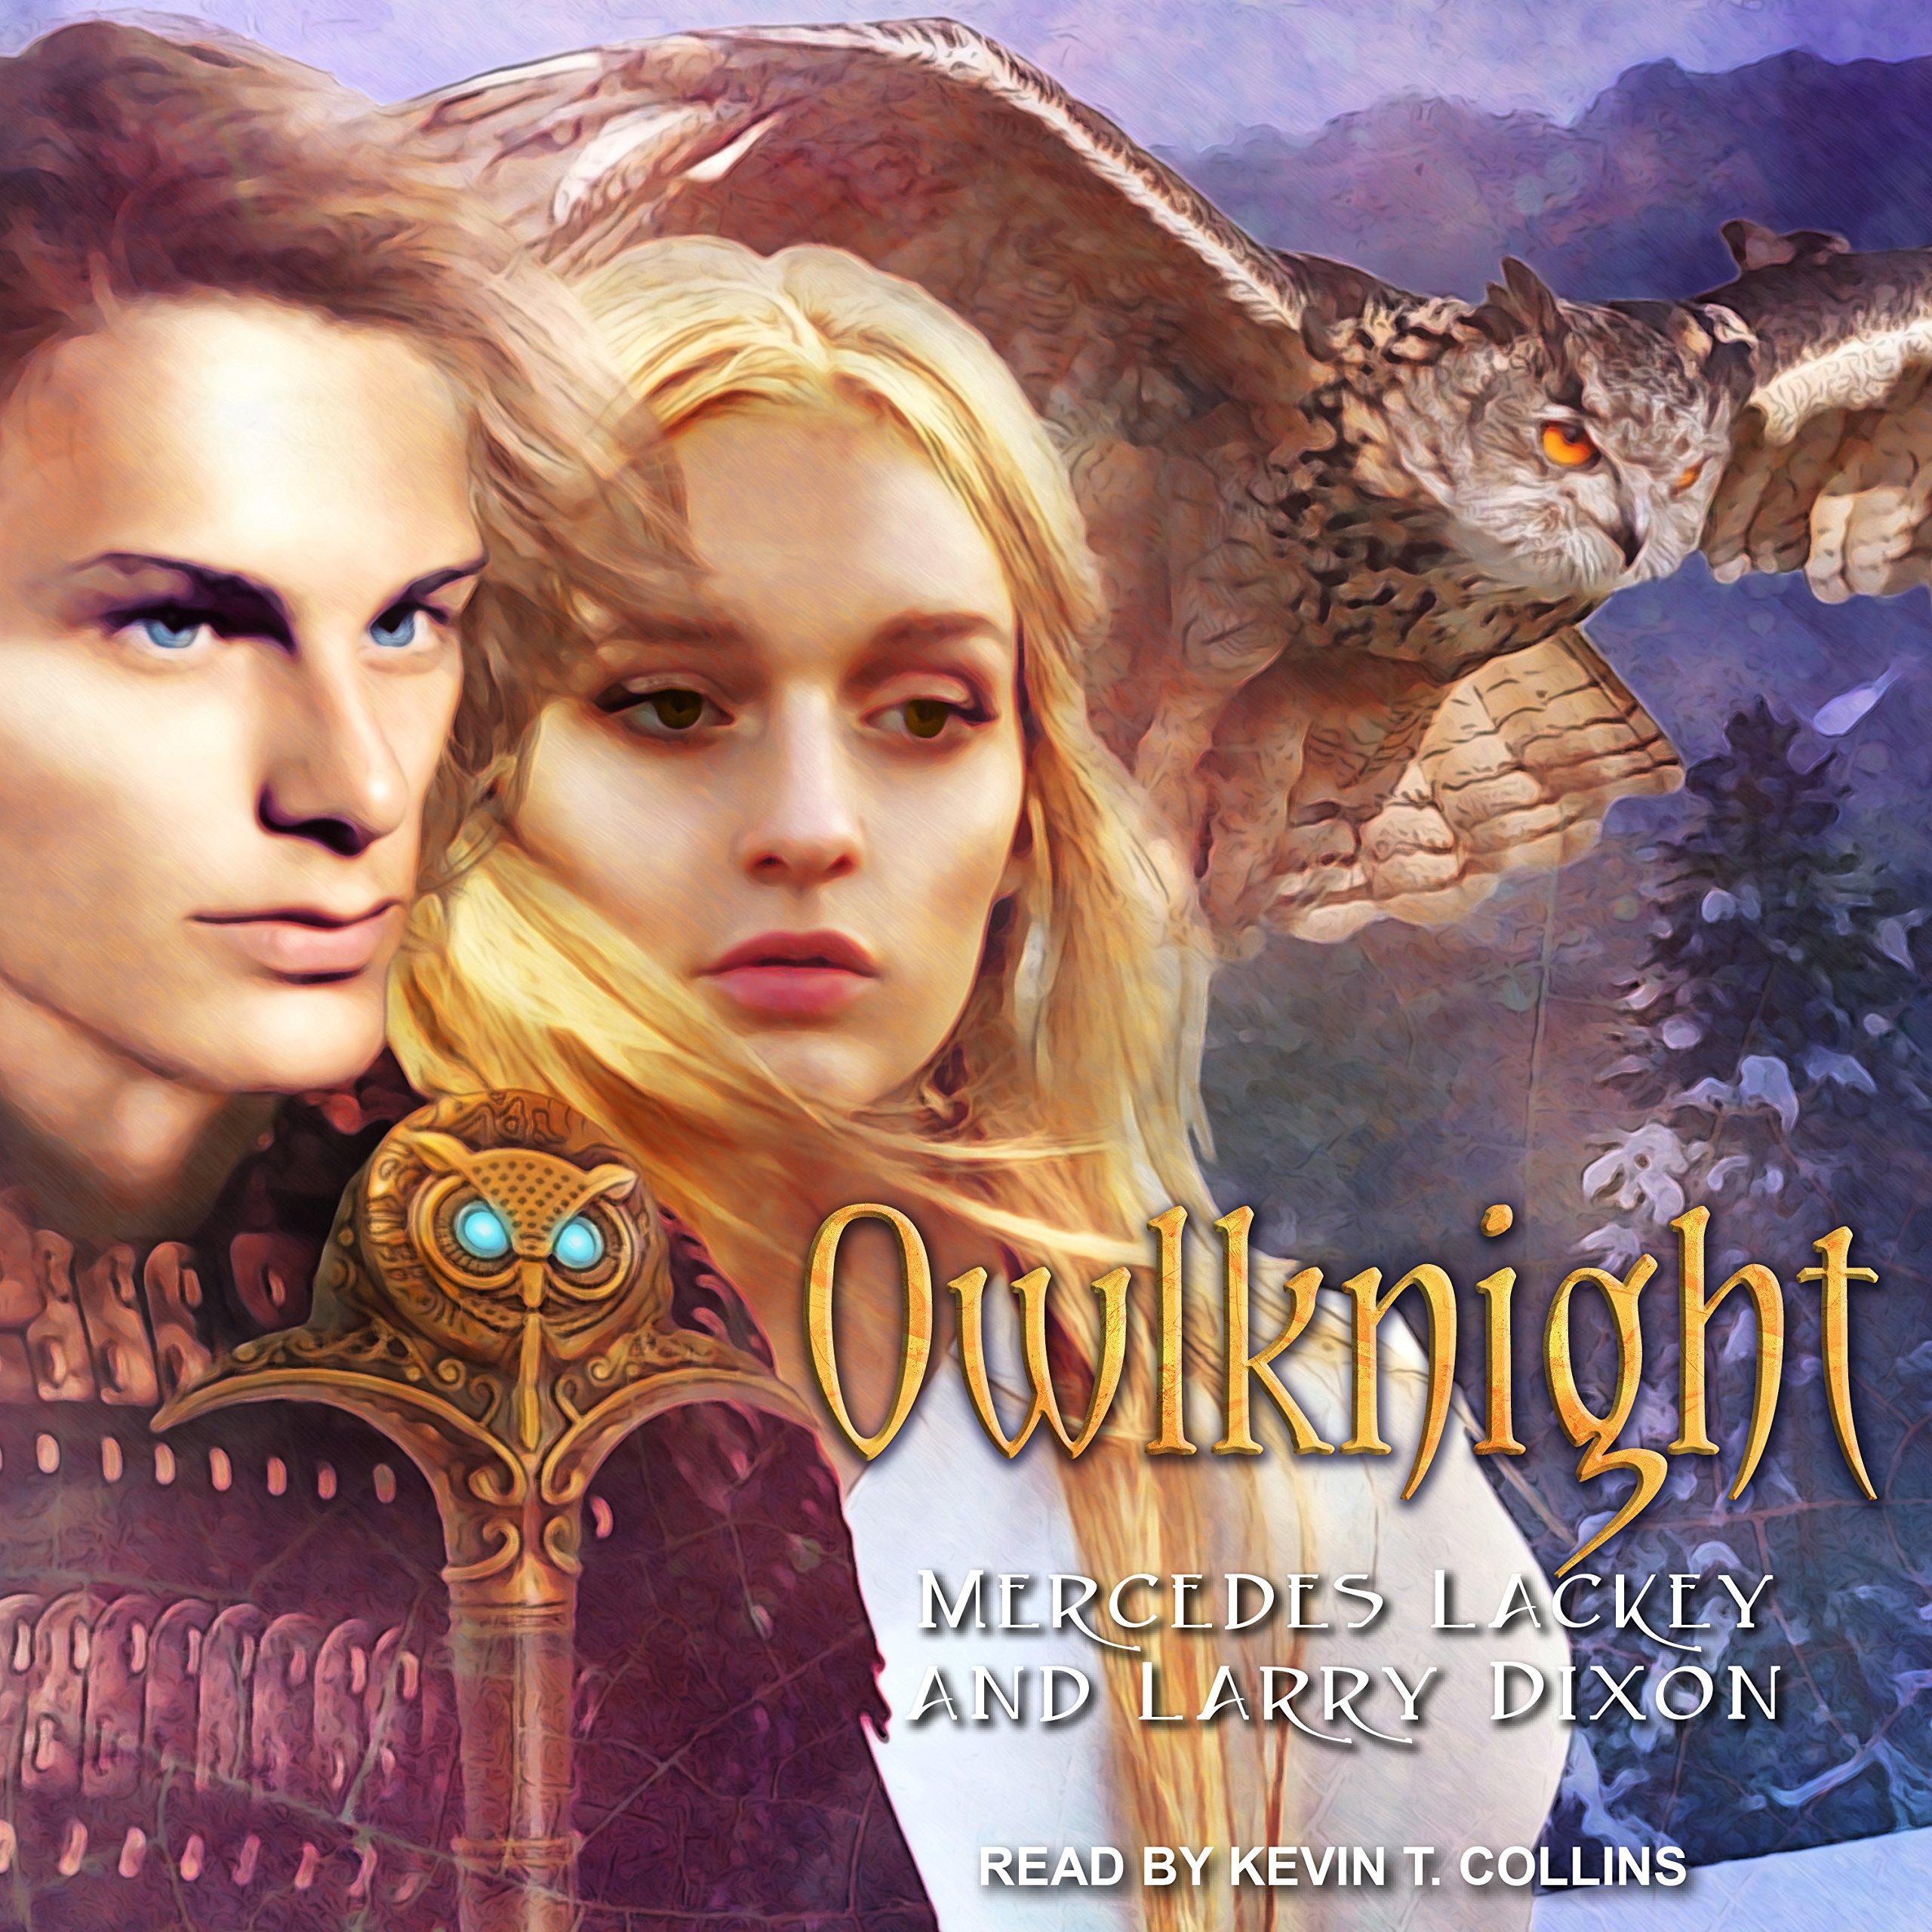 Owlknight (Owl Mage Trilogy): Amazon.co.uk: Mercedes Lackey, Larry Dixon,  Kevin T. Collins: 9781541409149: Books